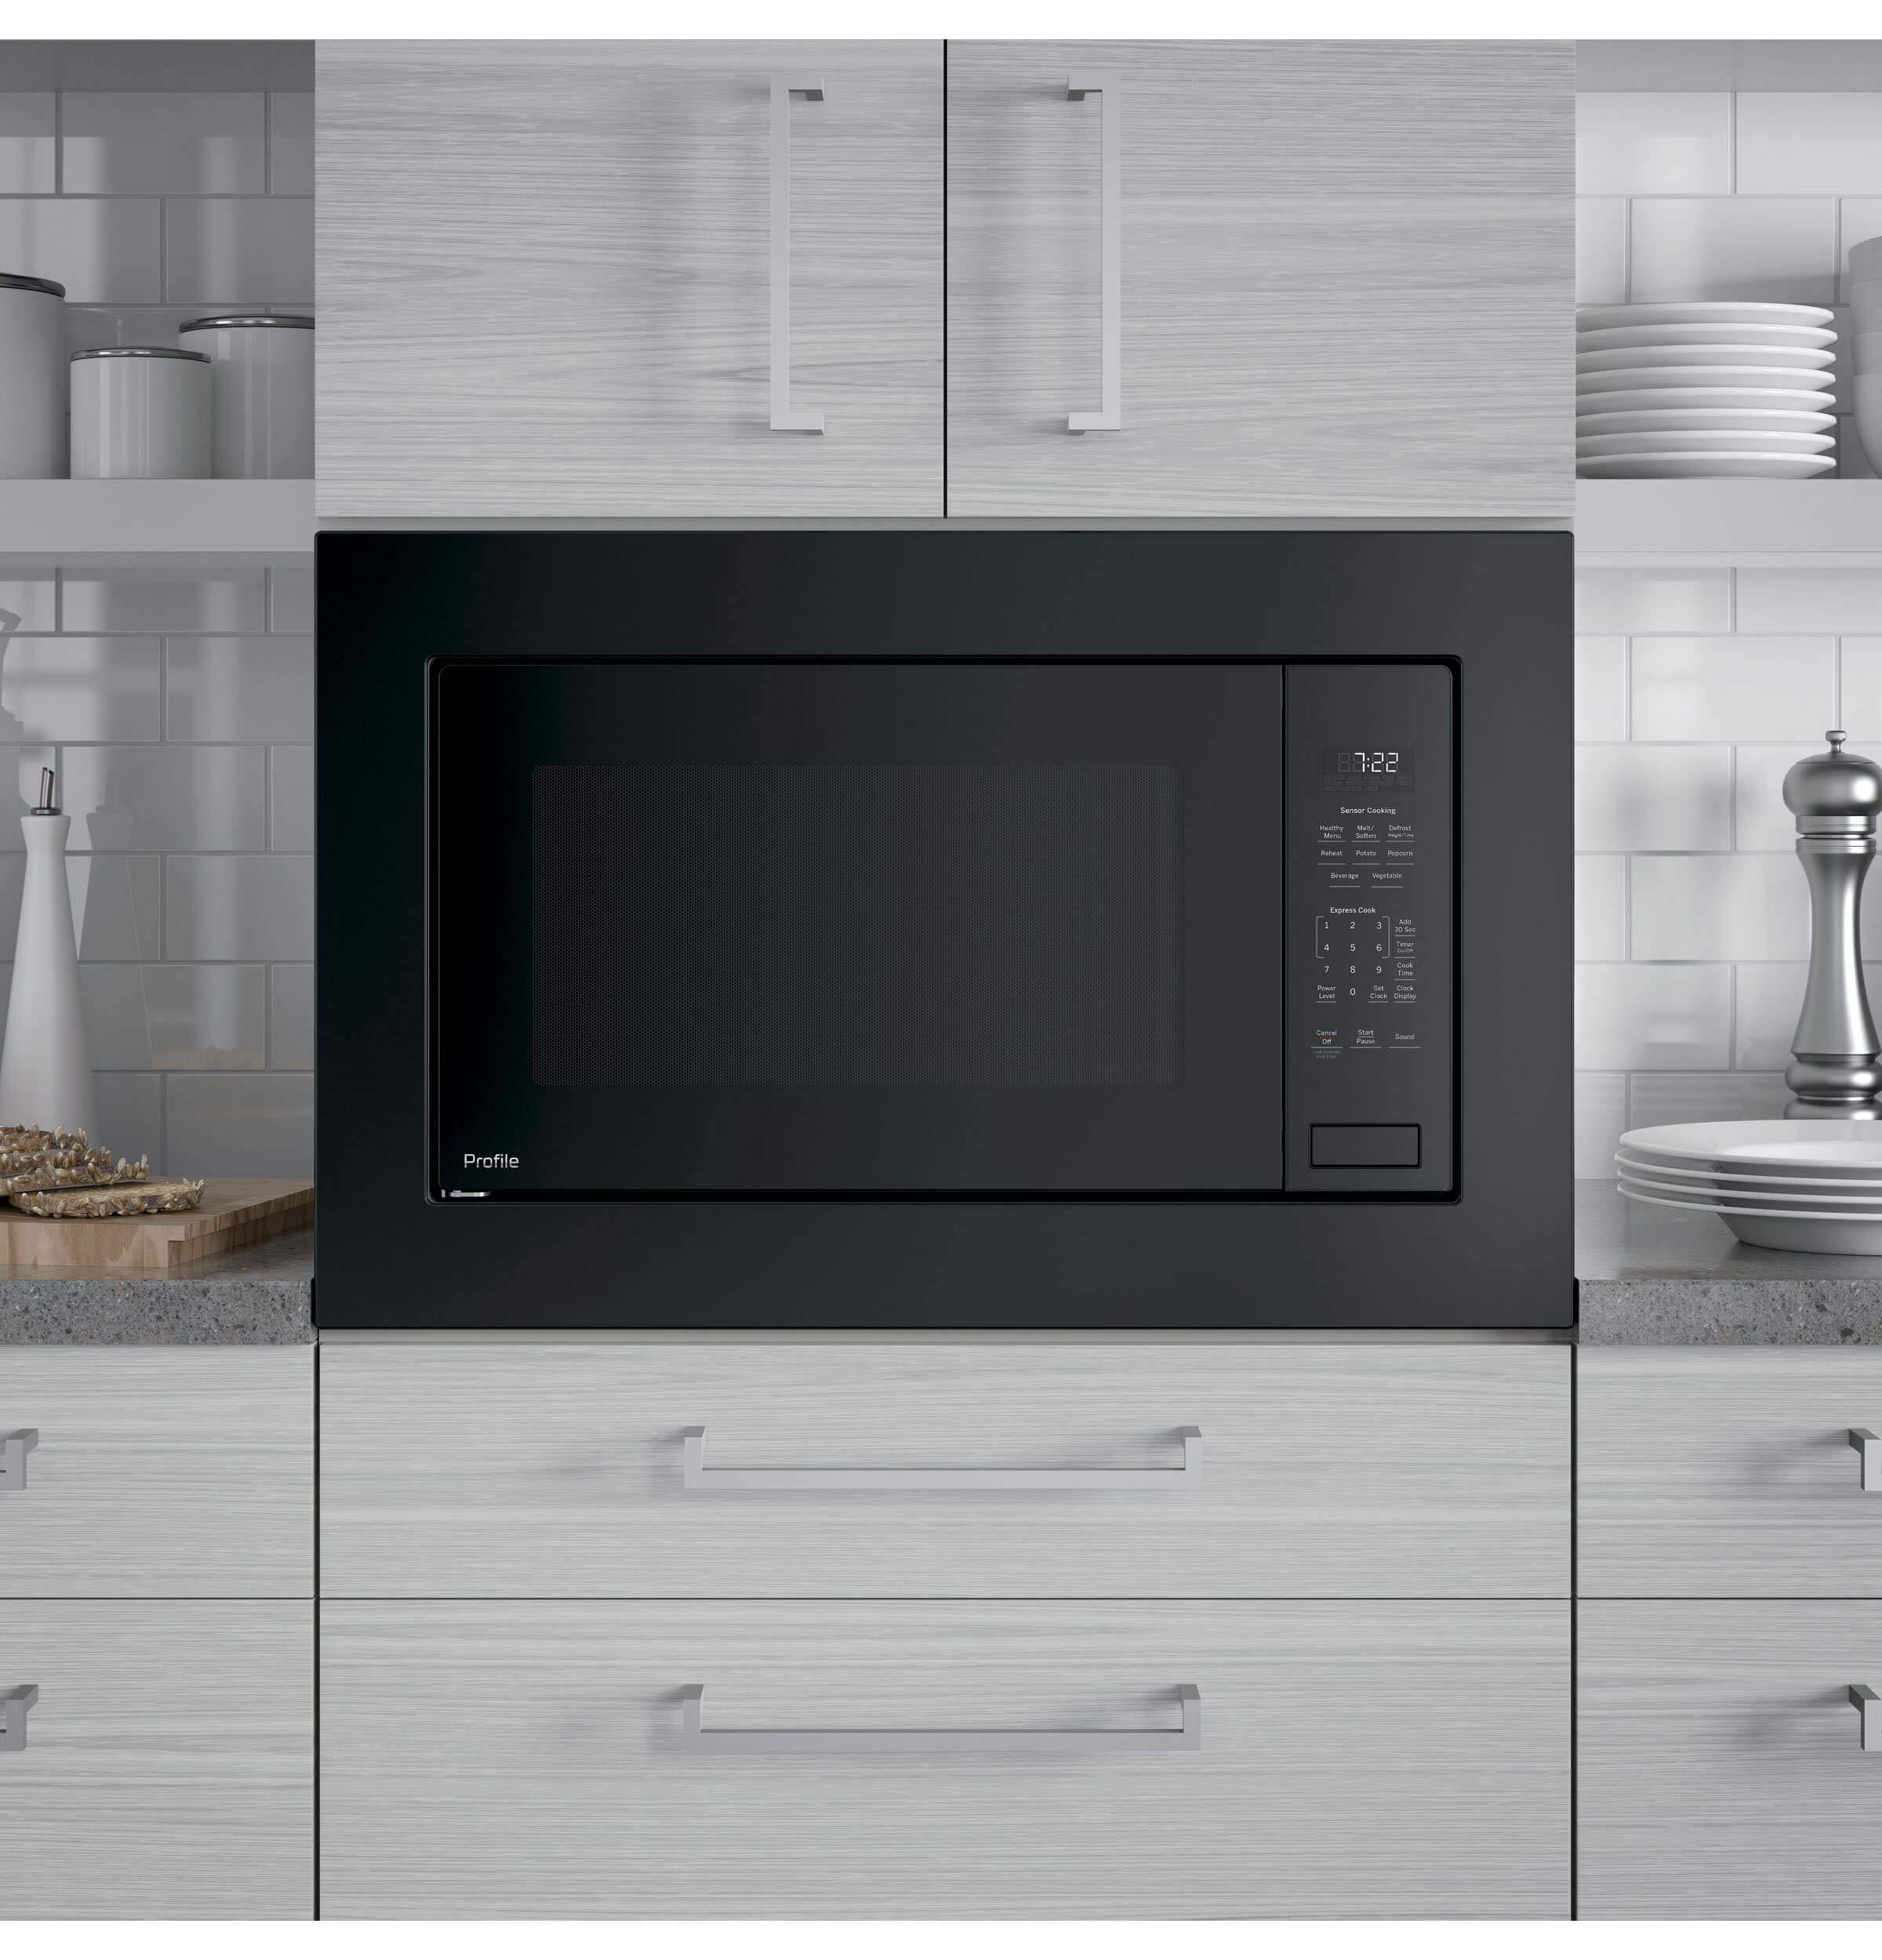 GE PEB7227DLBB Microwave Oven by GE (Image #5)